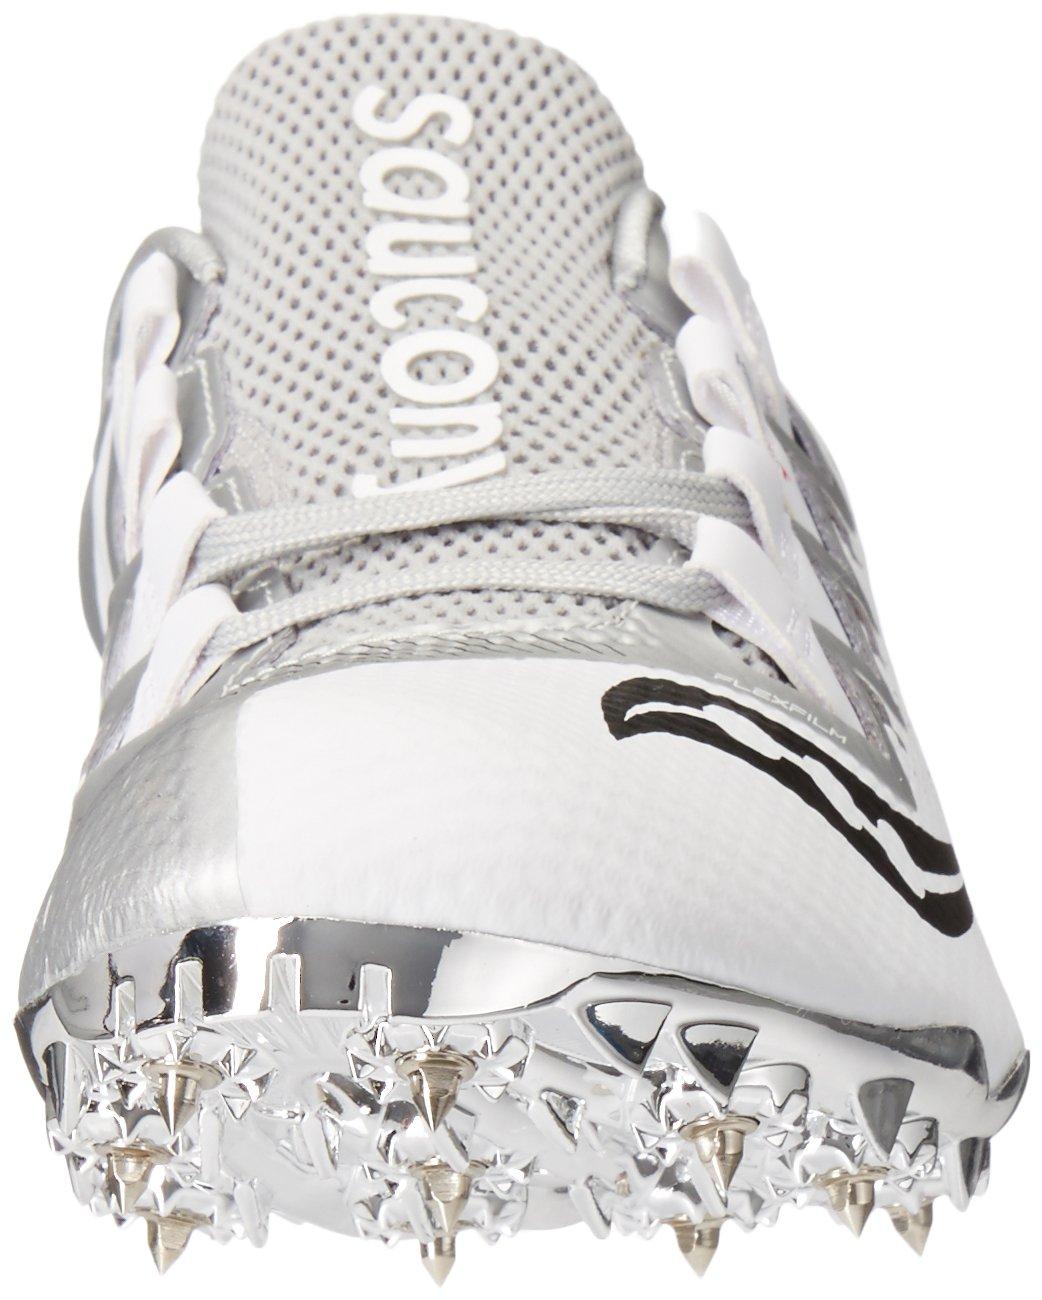 Saucony Women's Showdown 4 Track Shoe White/Silver 10 M US by Saucony (Image #4)